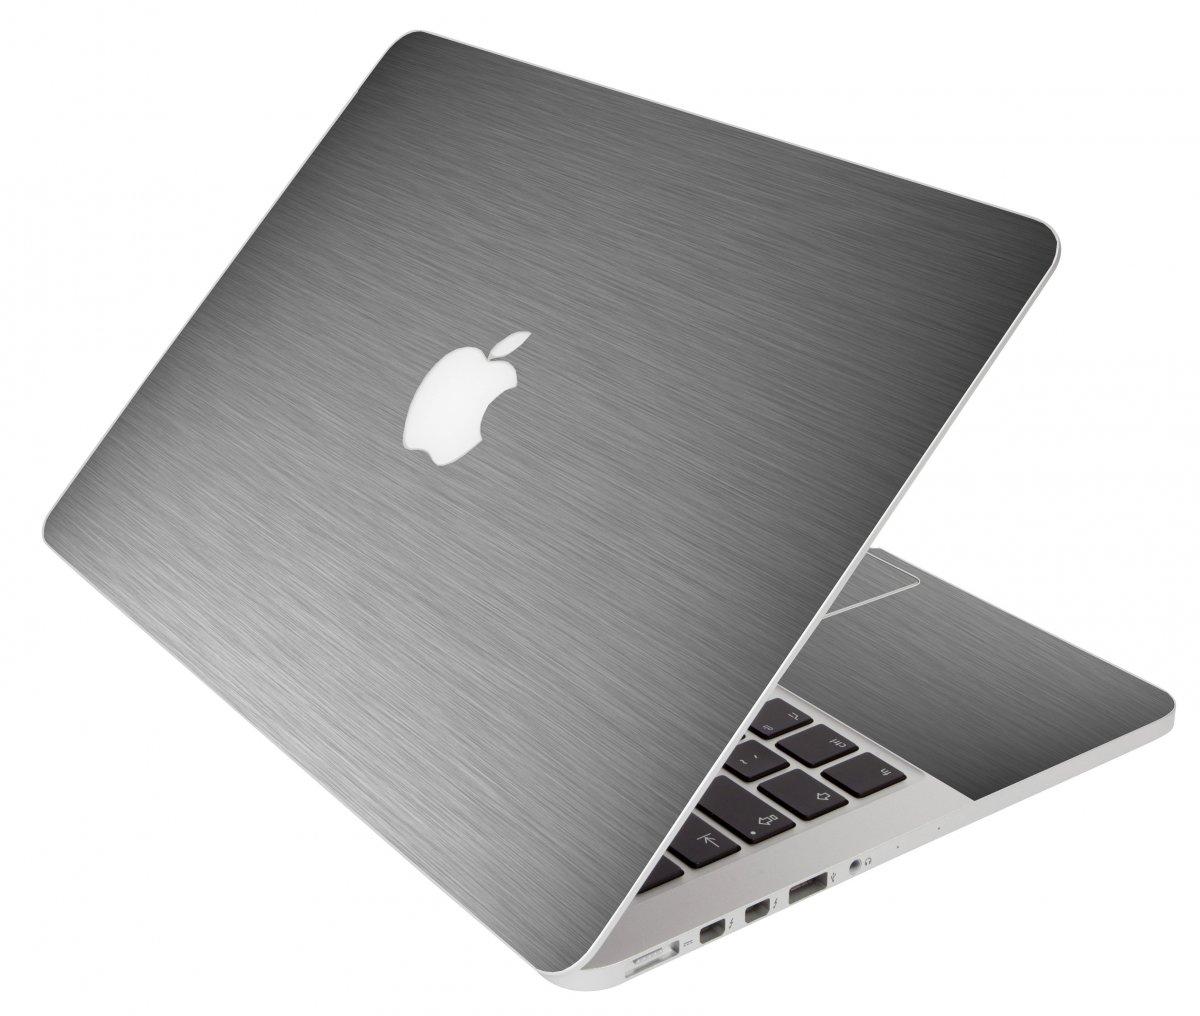 Mts#2 Apple Macbook Air 11 A1370 Laptop Skin